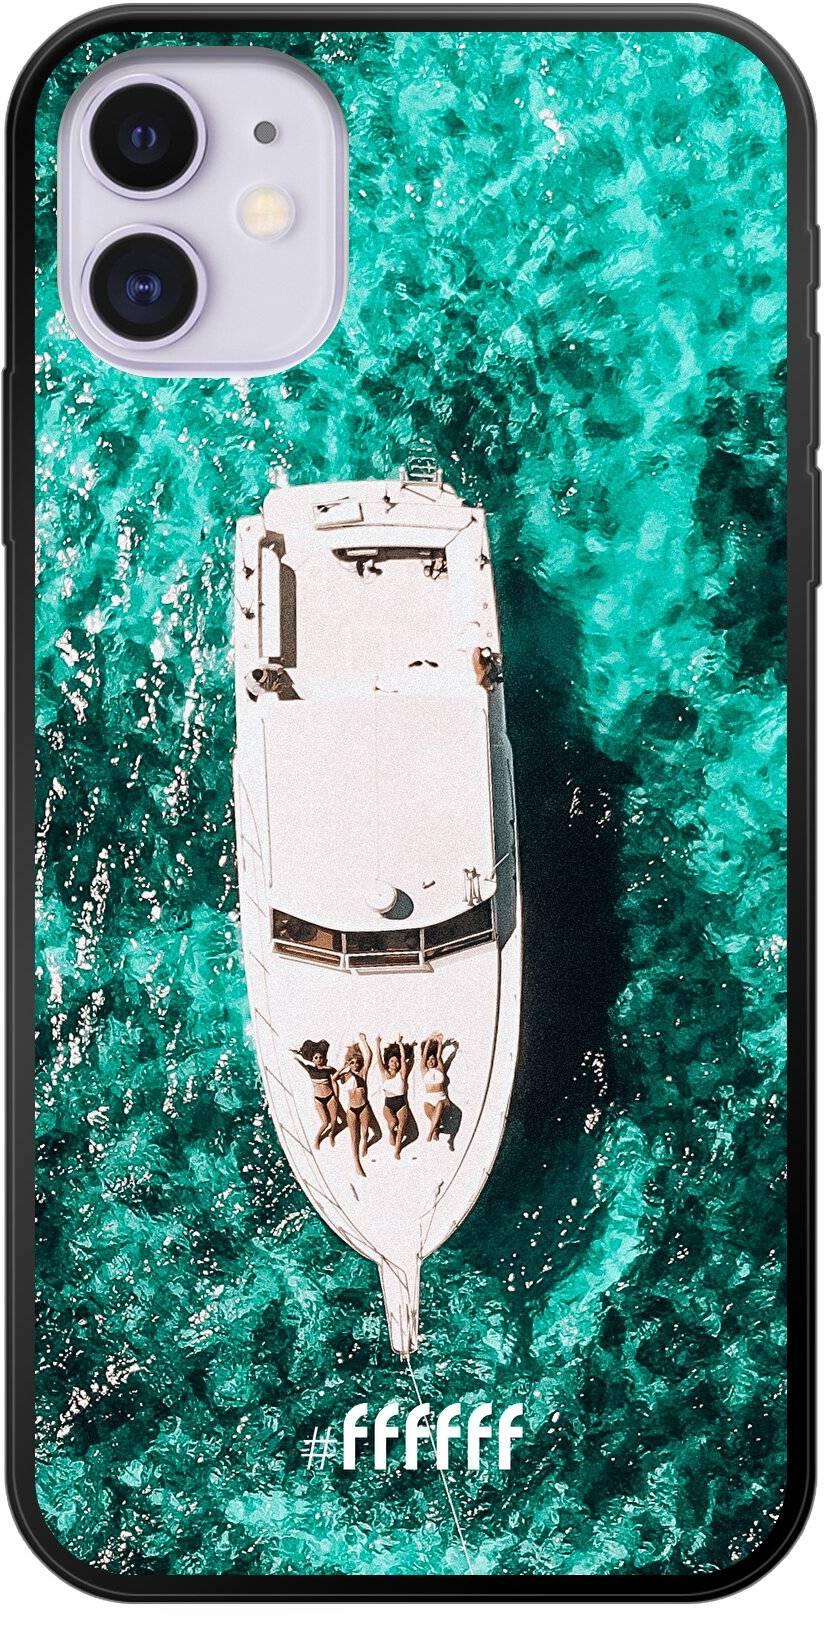 Yacht Life iPhone 11